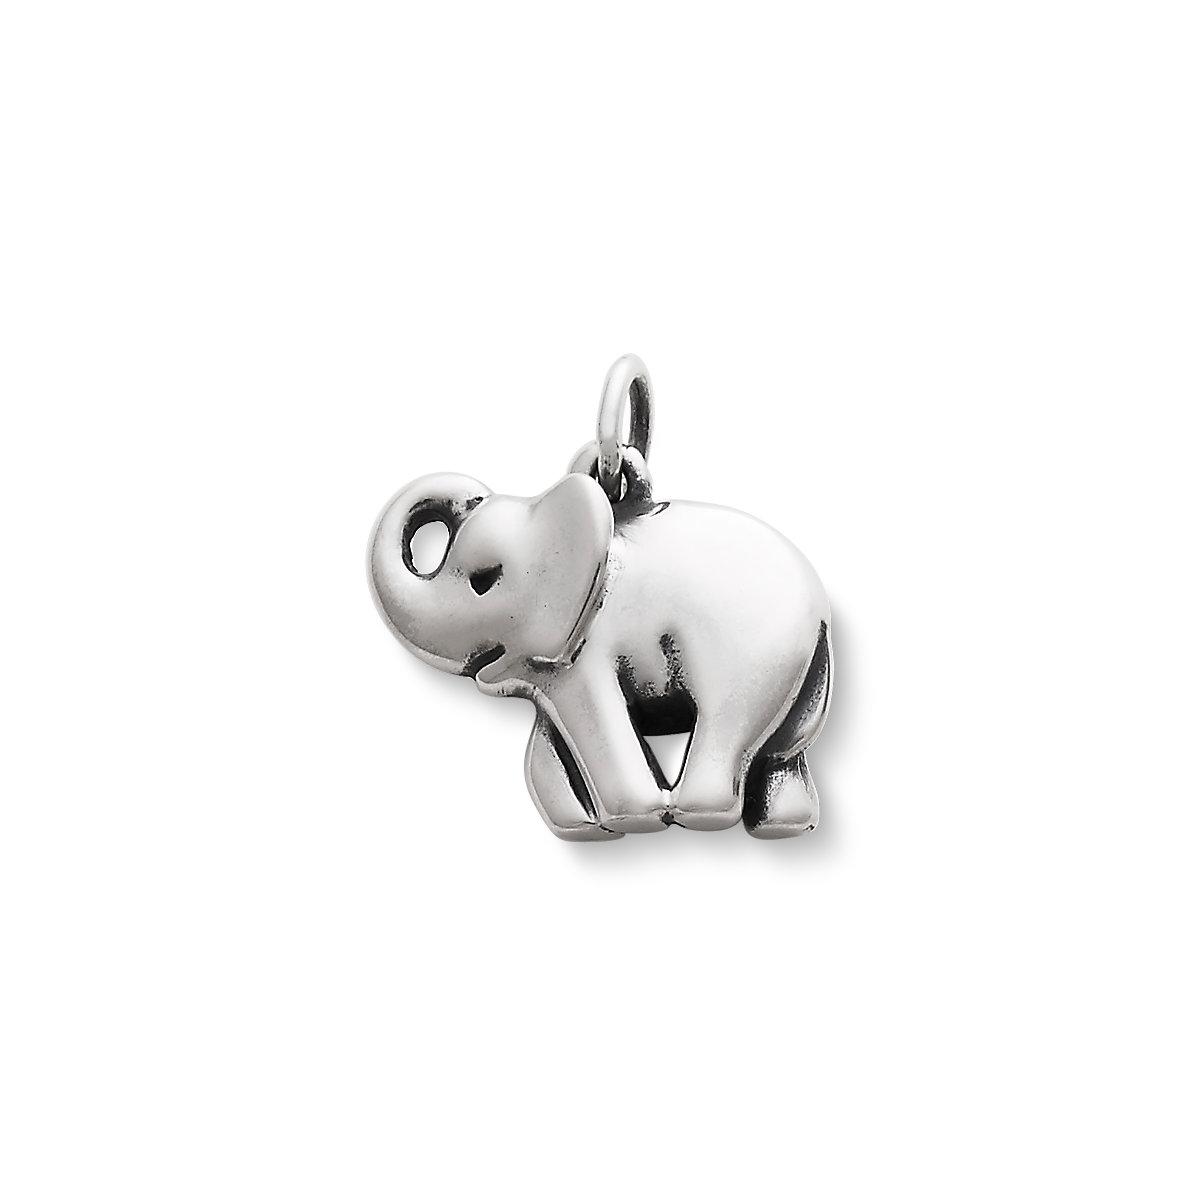 Elephant Charm - James Avery